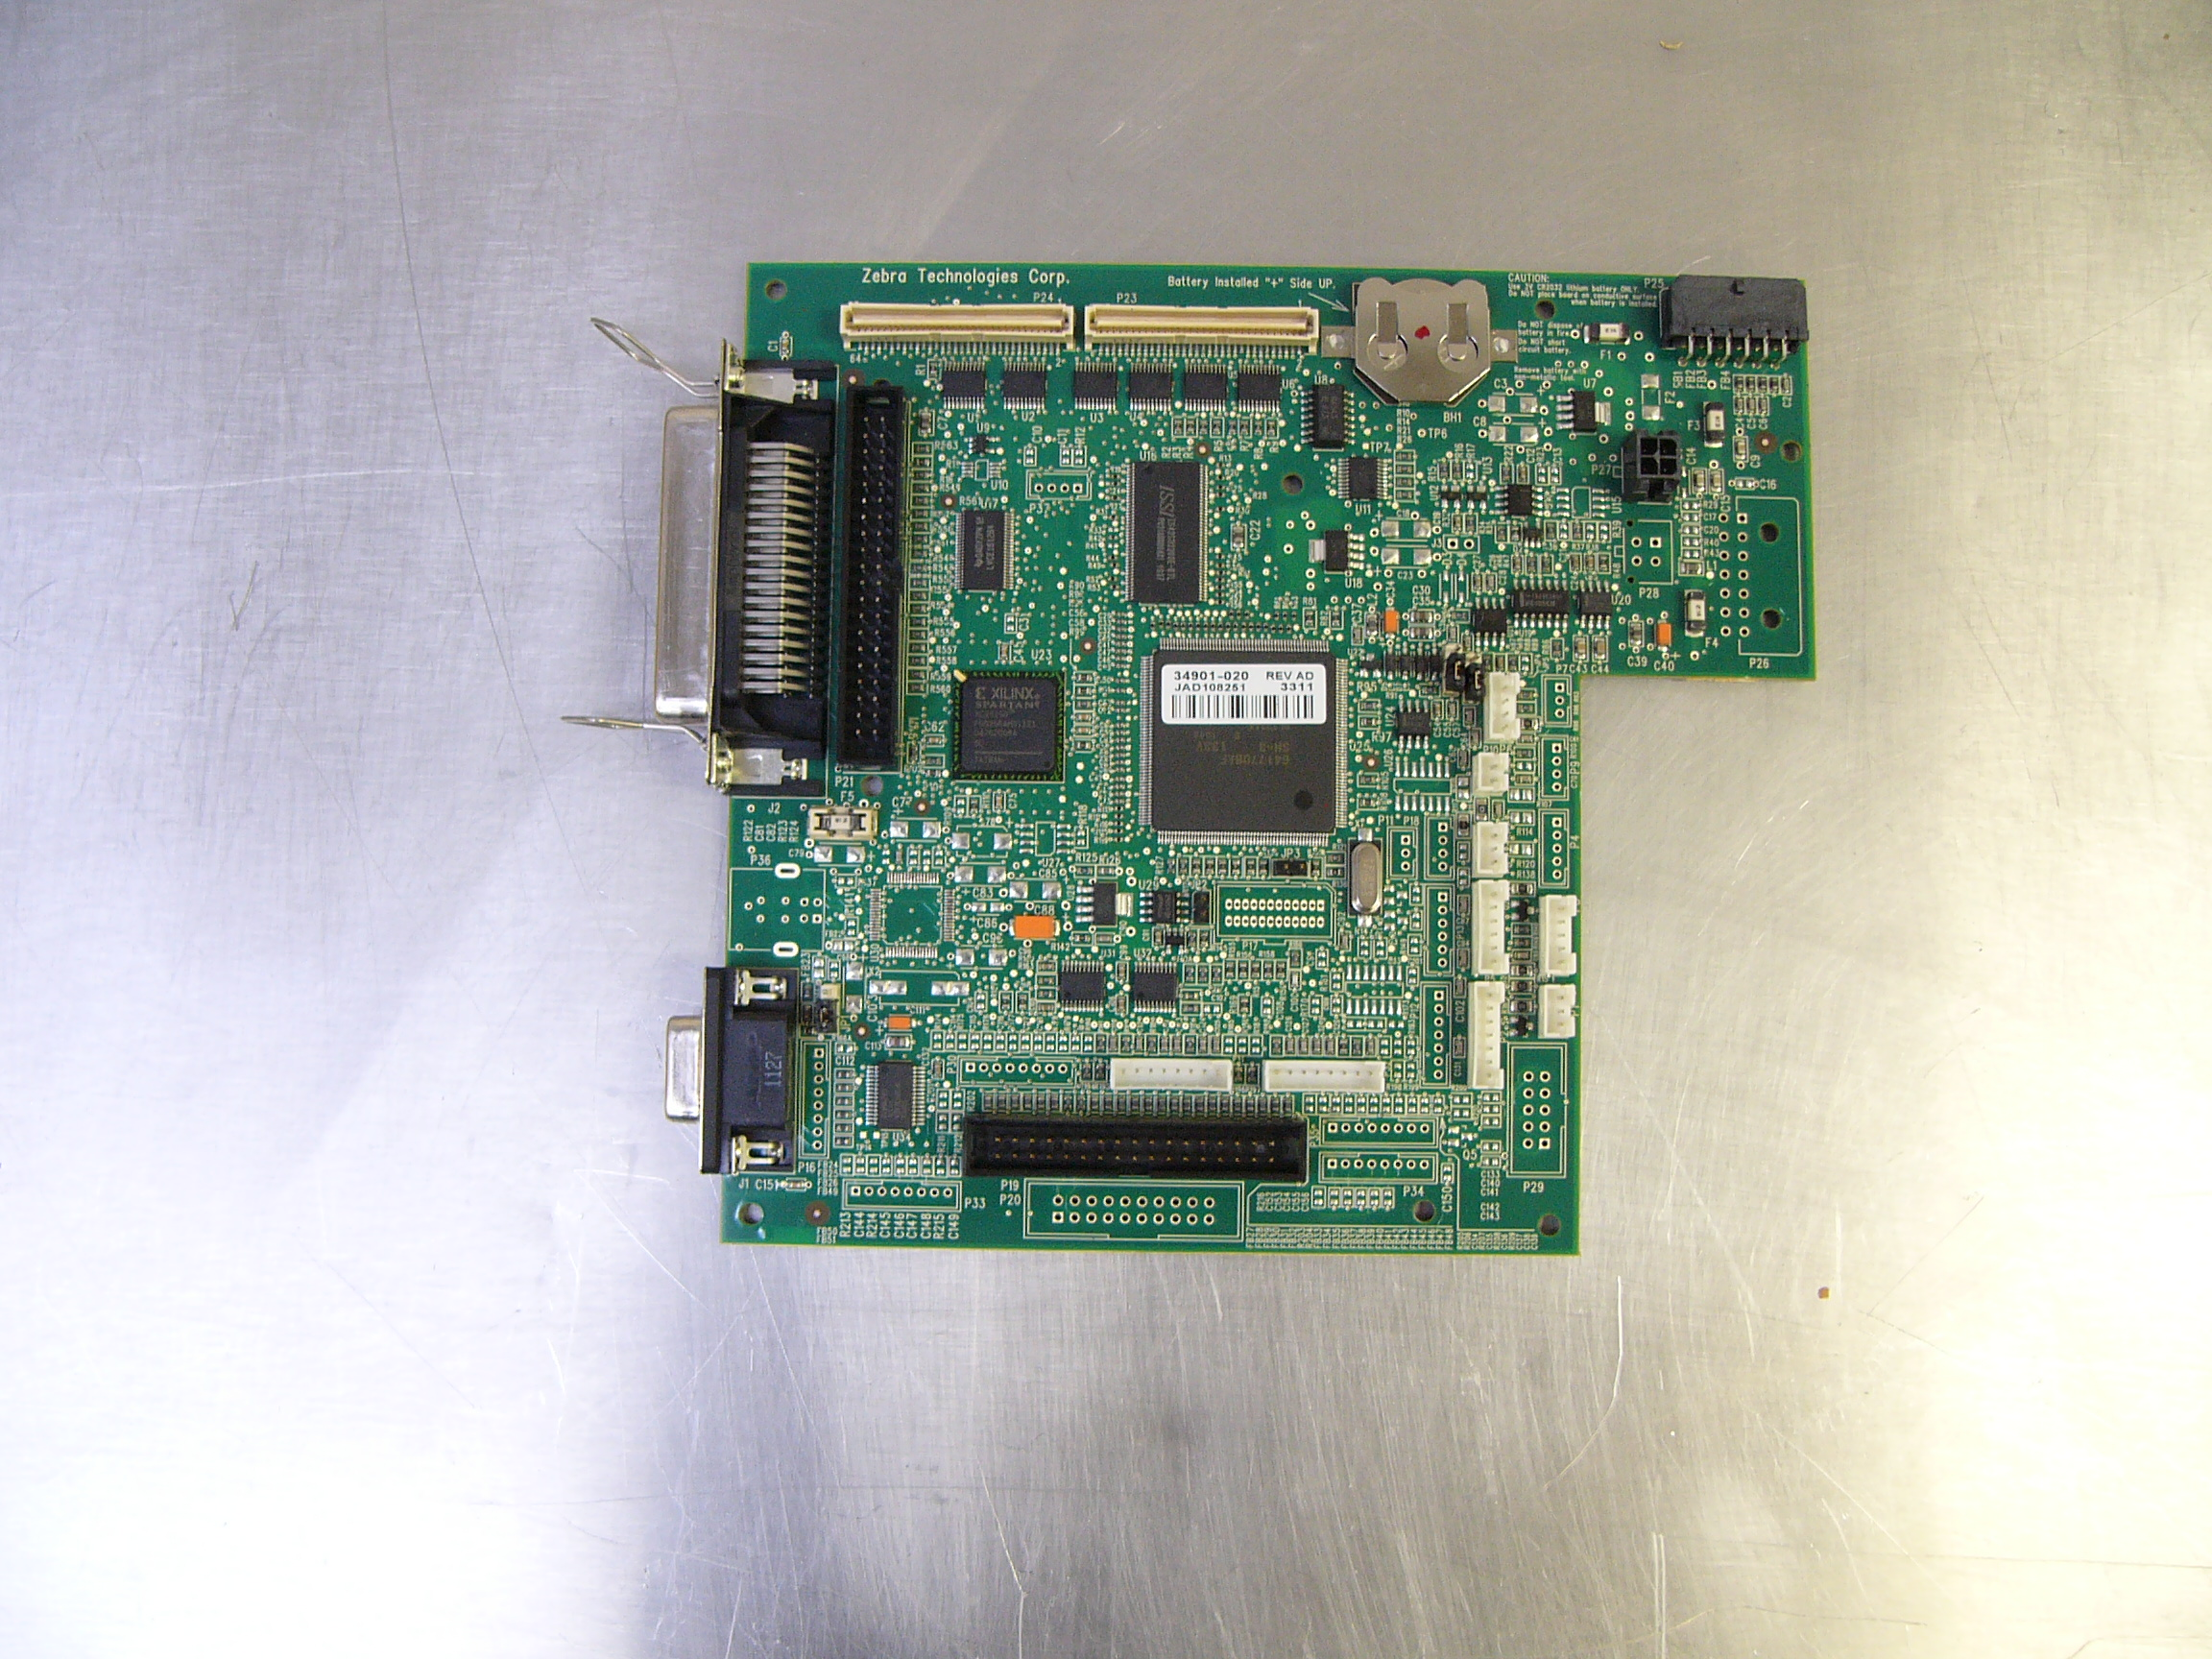 34901-020M -  - 34901-020M, 4MB Main Logic Board, Zebra 105SL see description